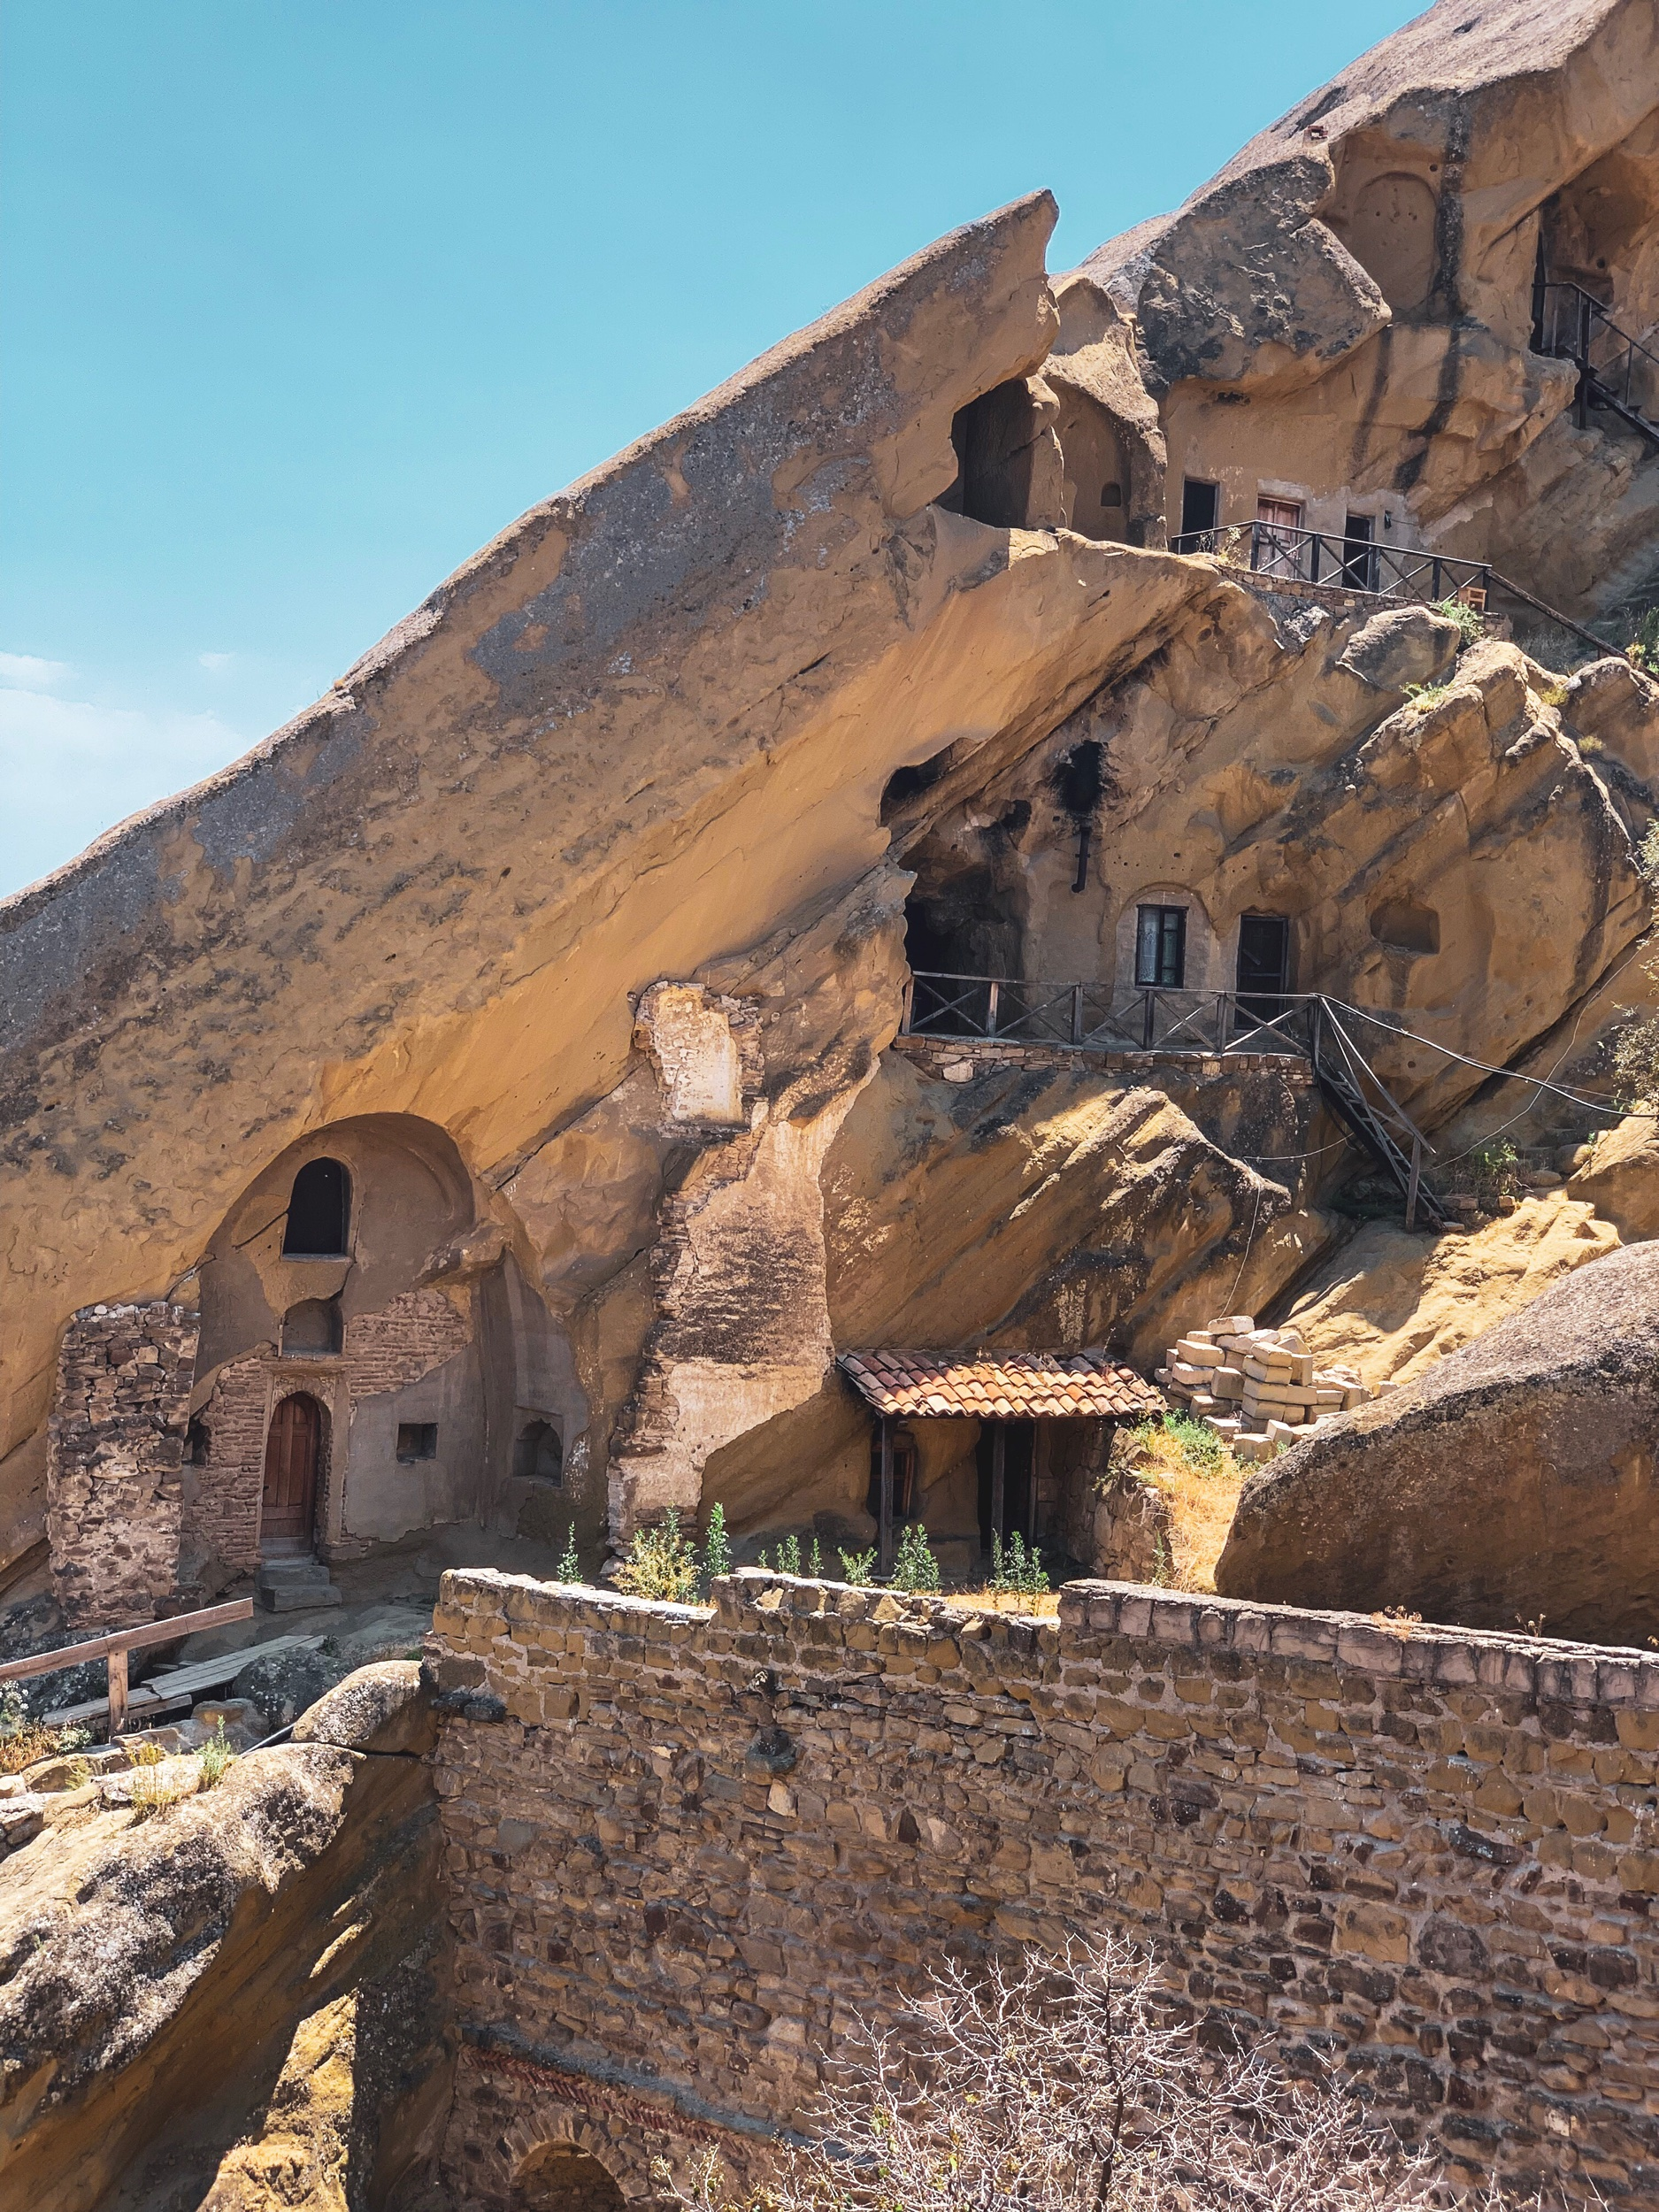 Monks quarters in the cave monastery of David Gareji